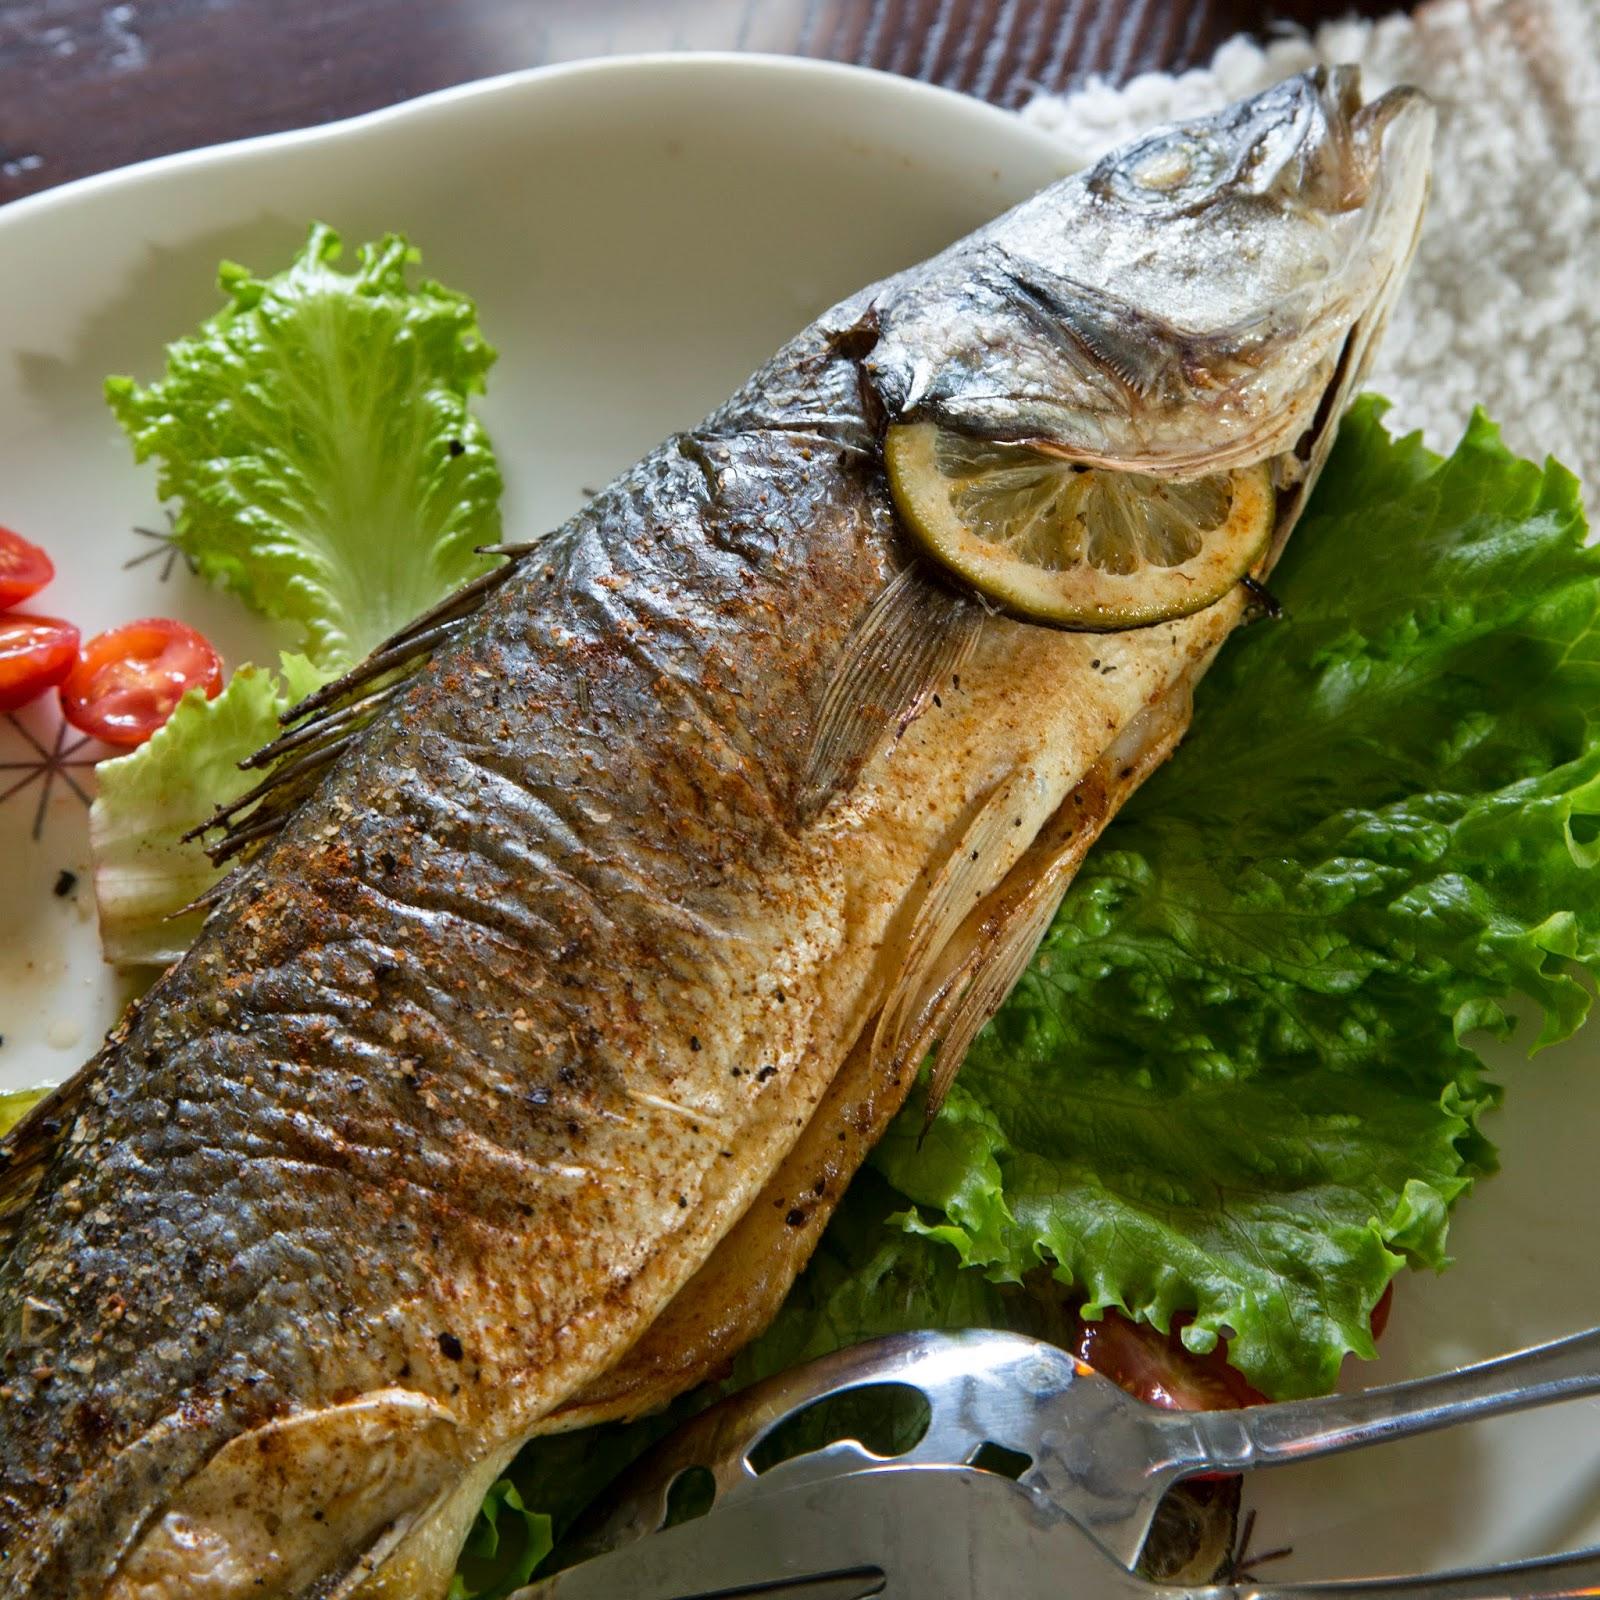 Showfood chef simple whole roasted branzino for What is branzino fish